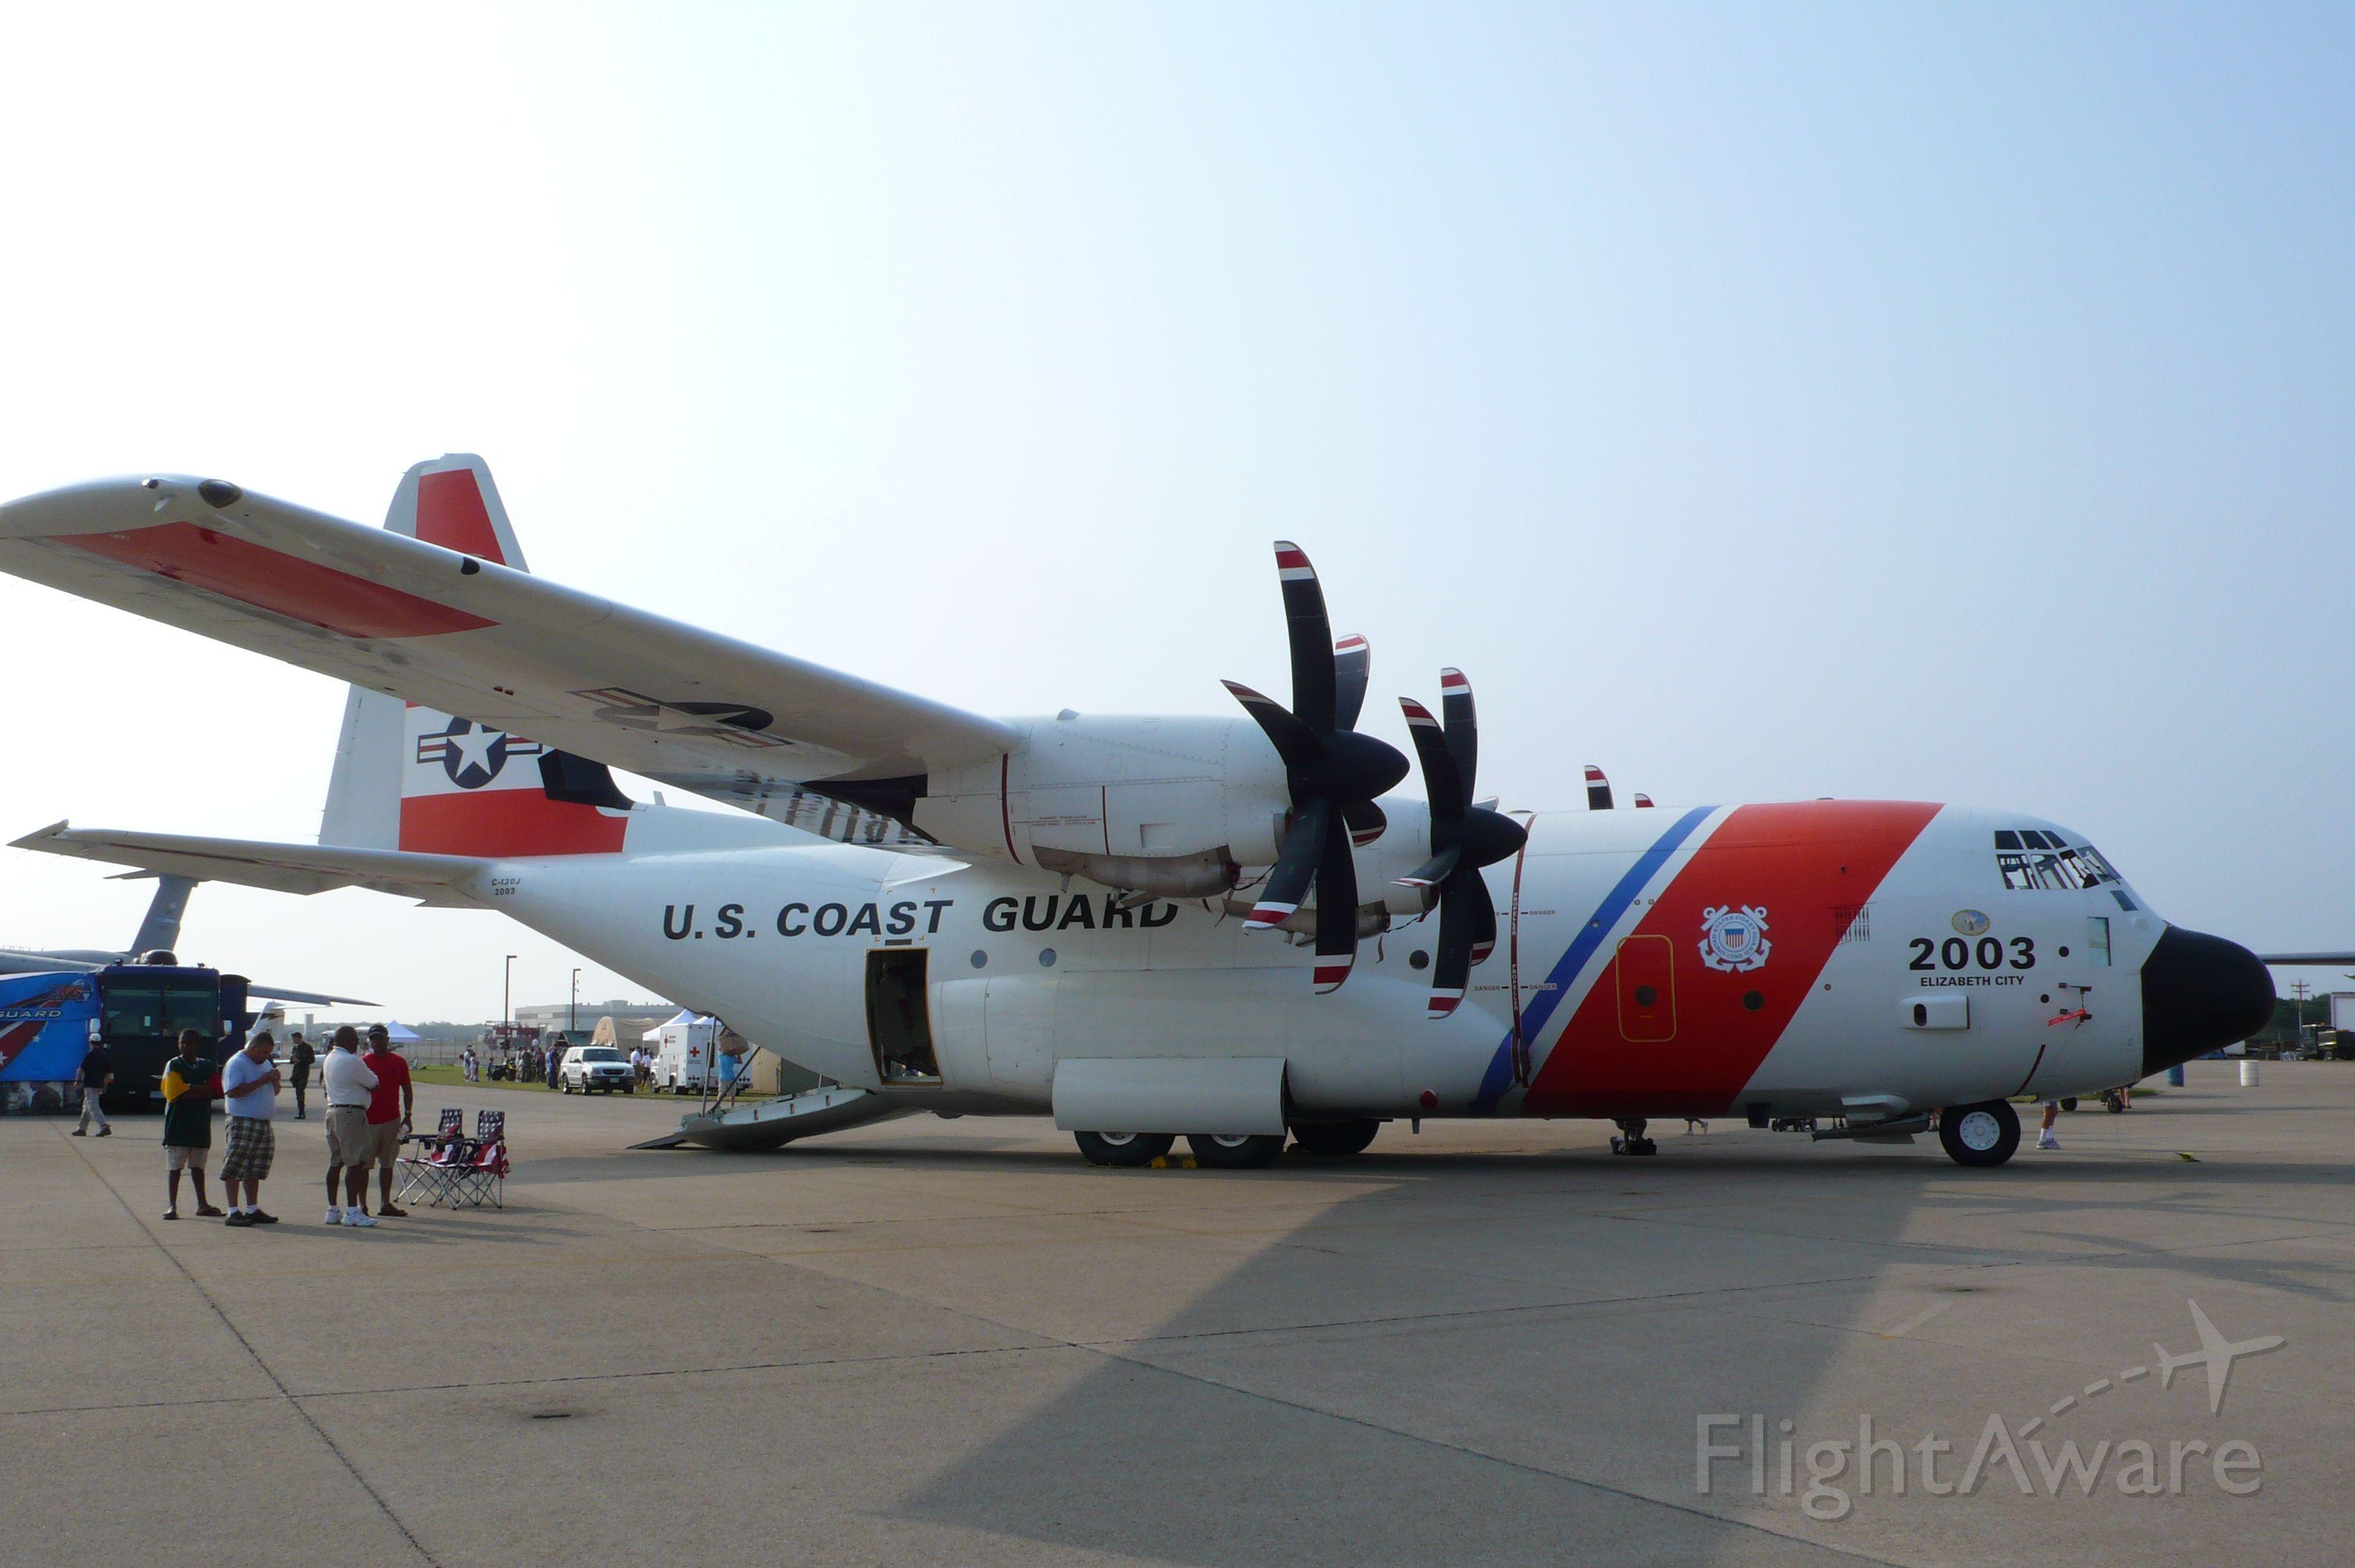 Lockheed C-130 Hercules — - 2007 OTIS Air Show, US Coast Guards C-130J